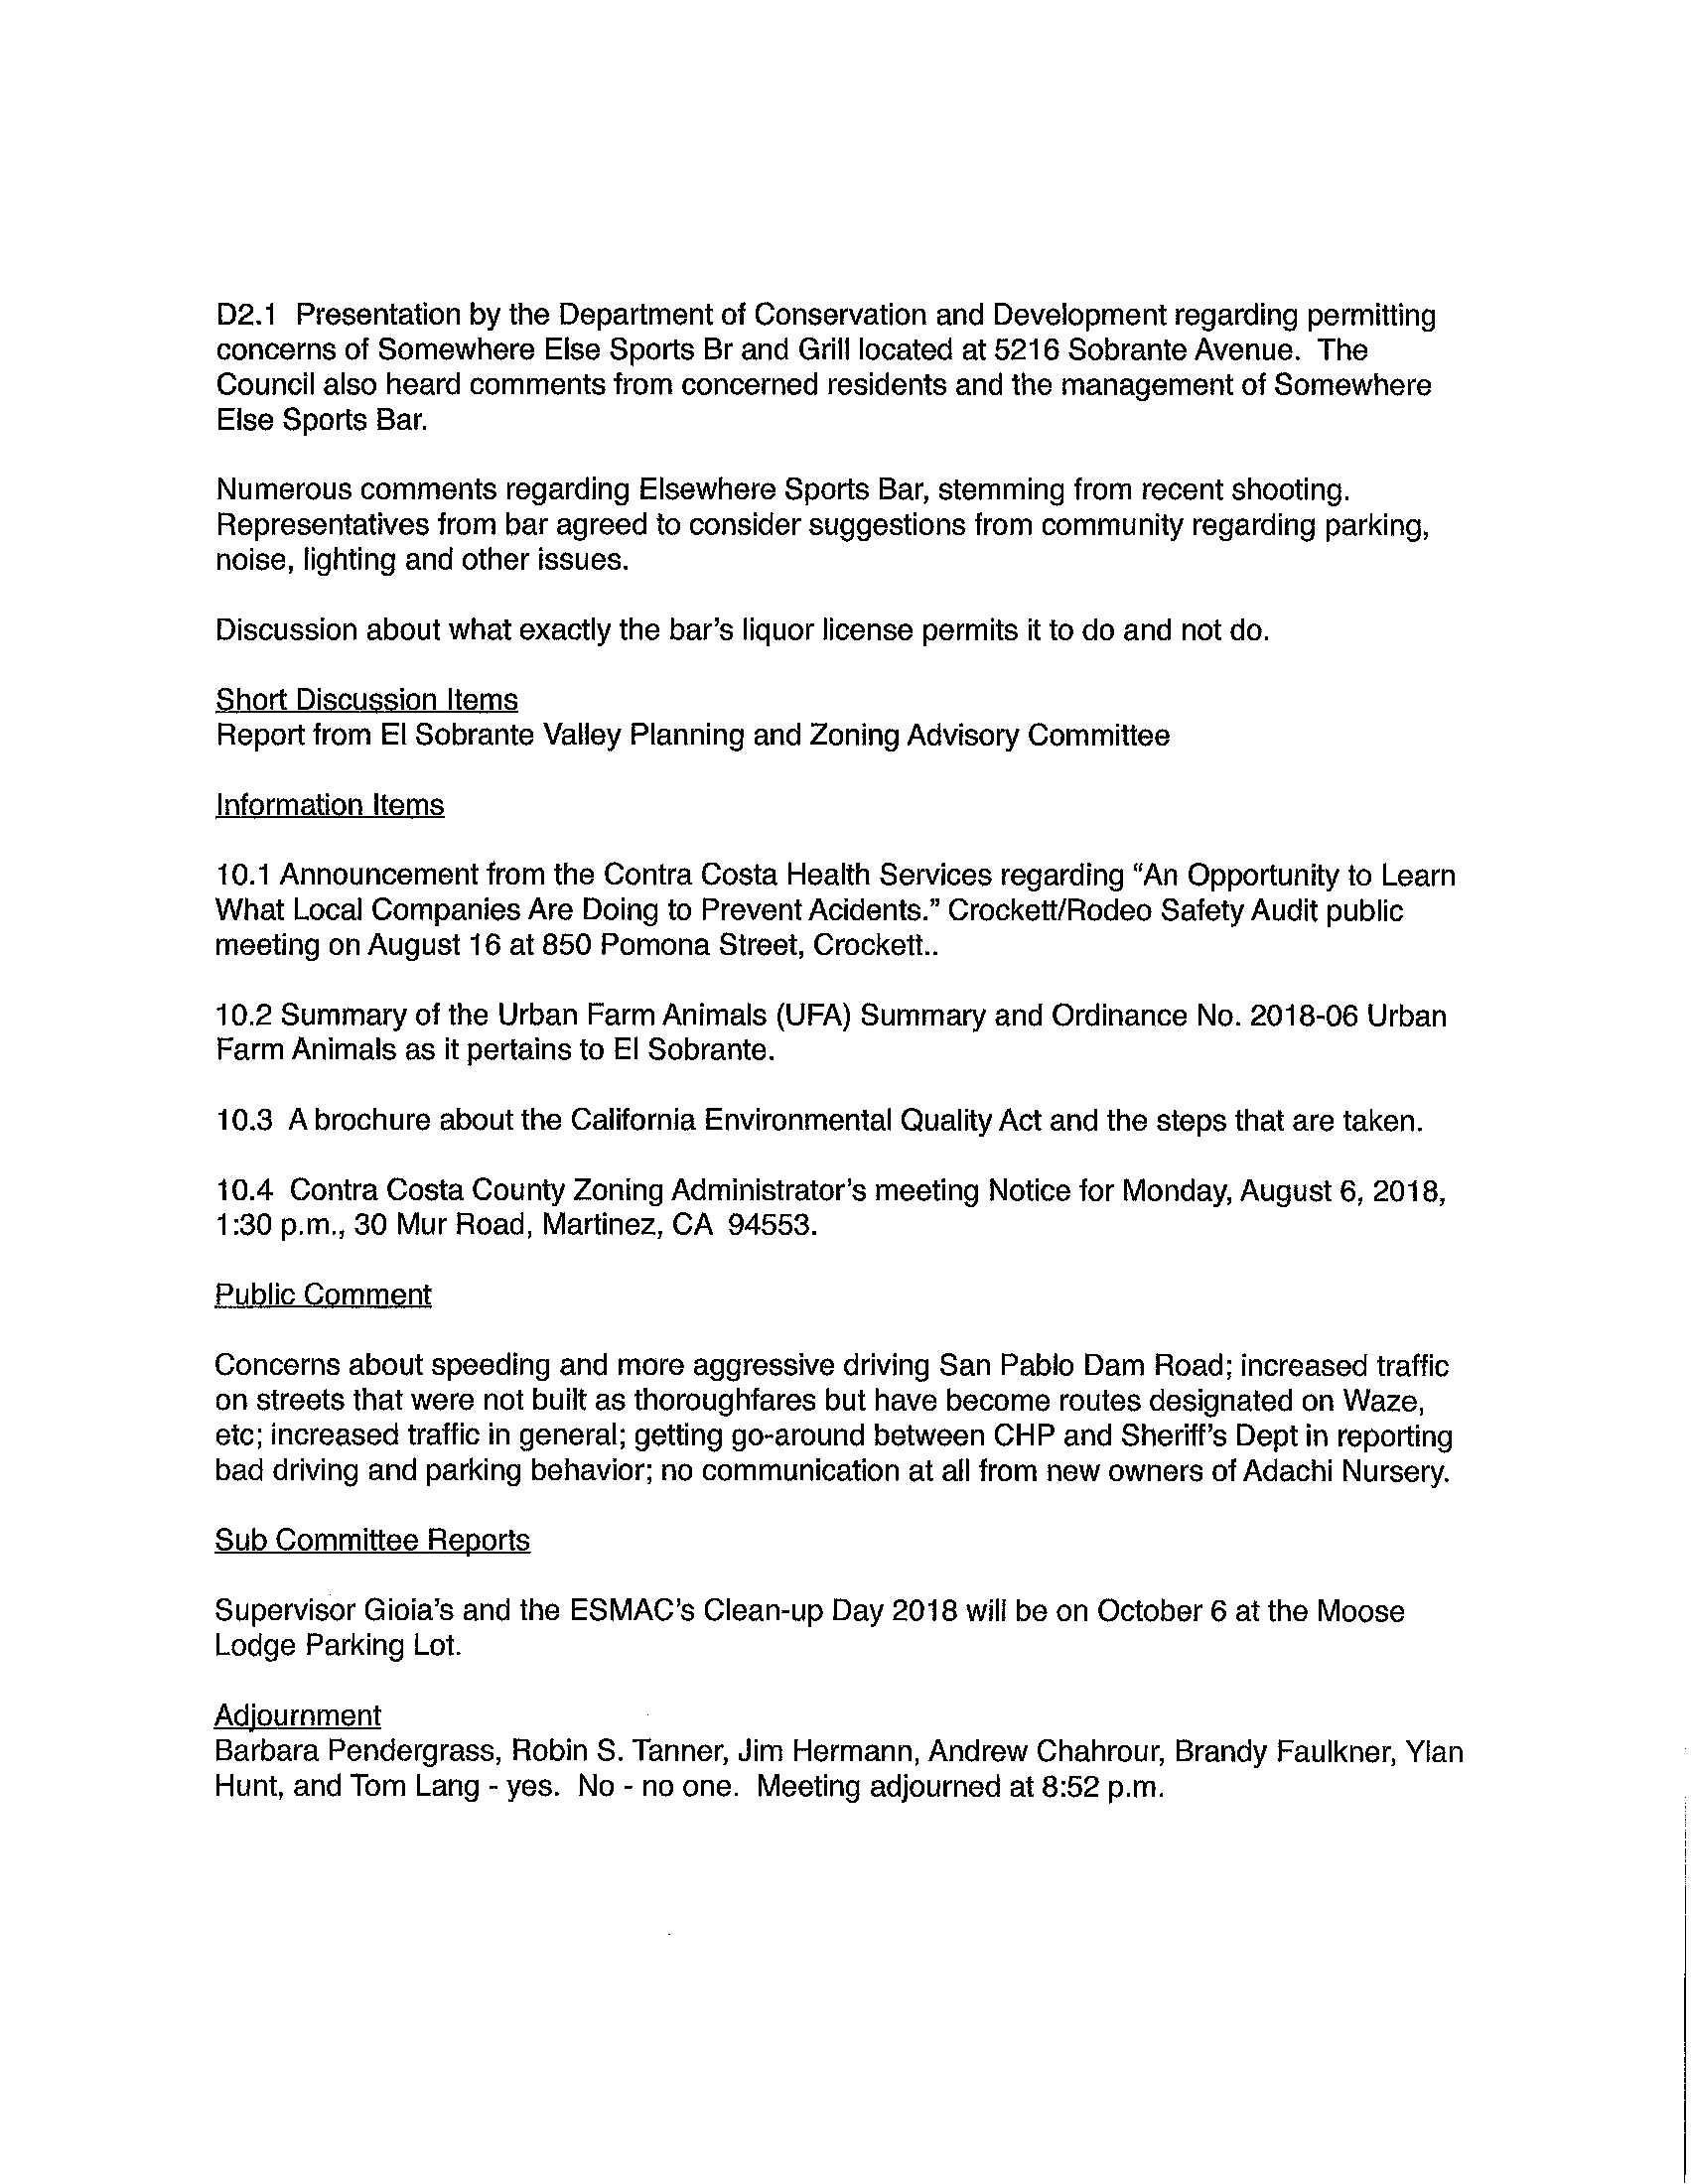 ESMAC Agenda 09.12.2018 (22 Pages)_4.jpg